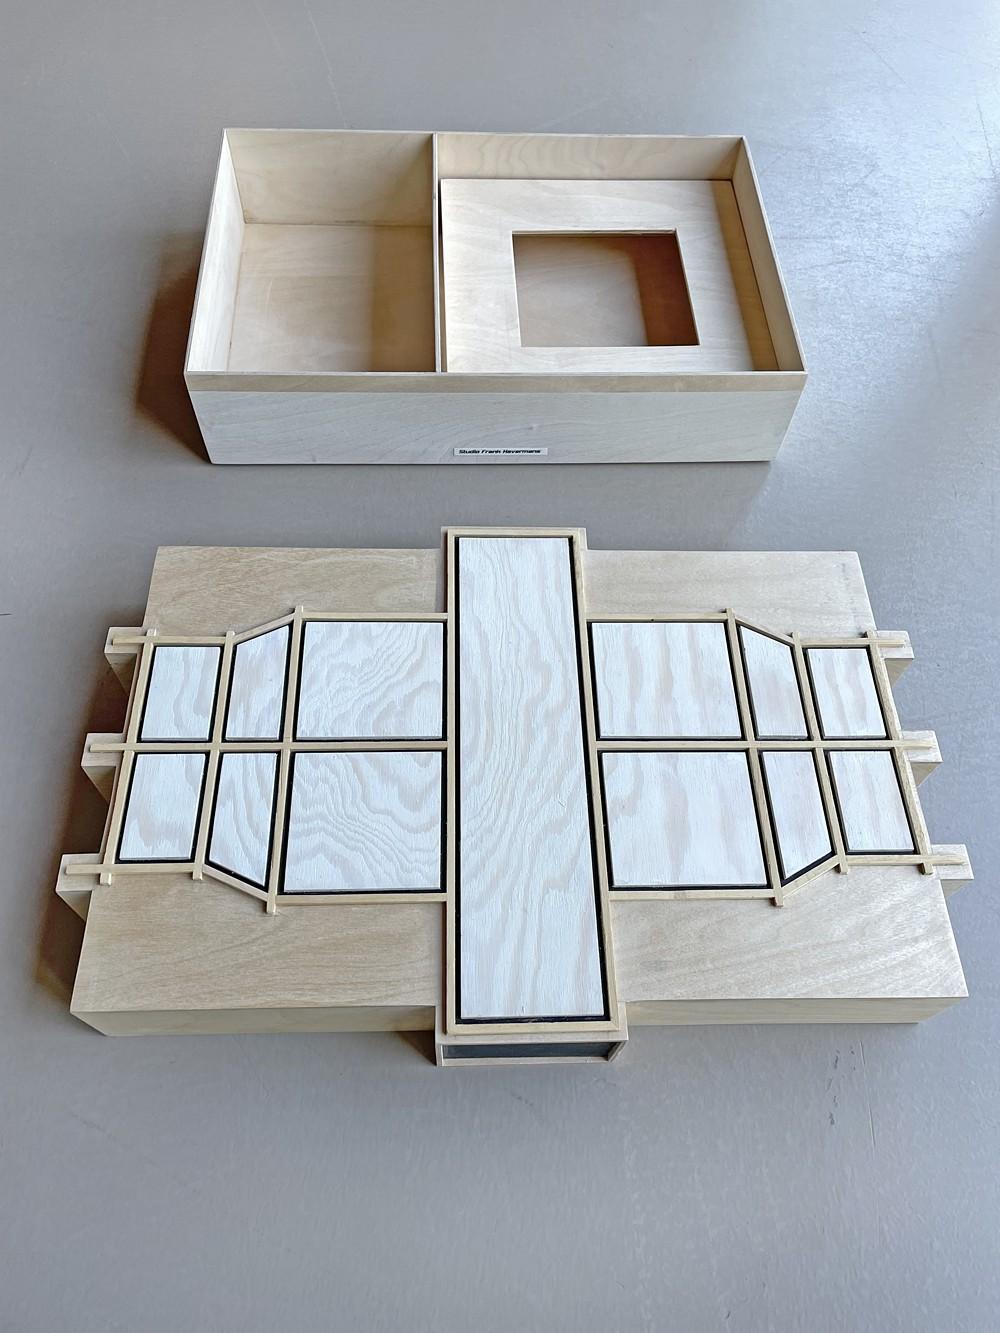 Studio-Frank-Havermans-Liber-Amicorum-Box-ZIN_4